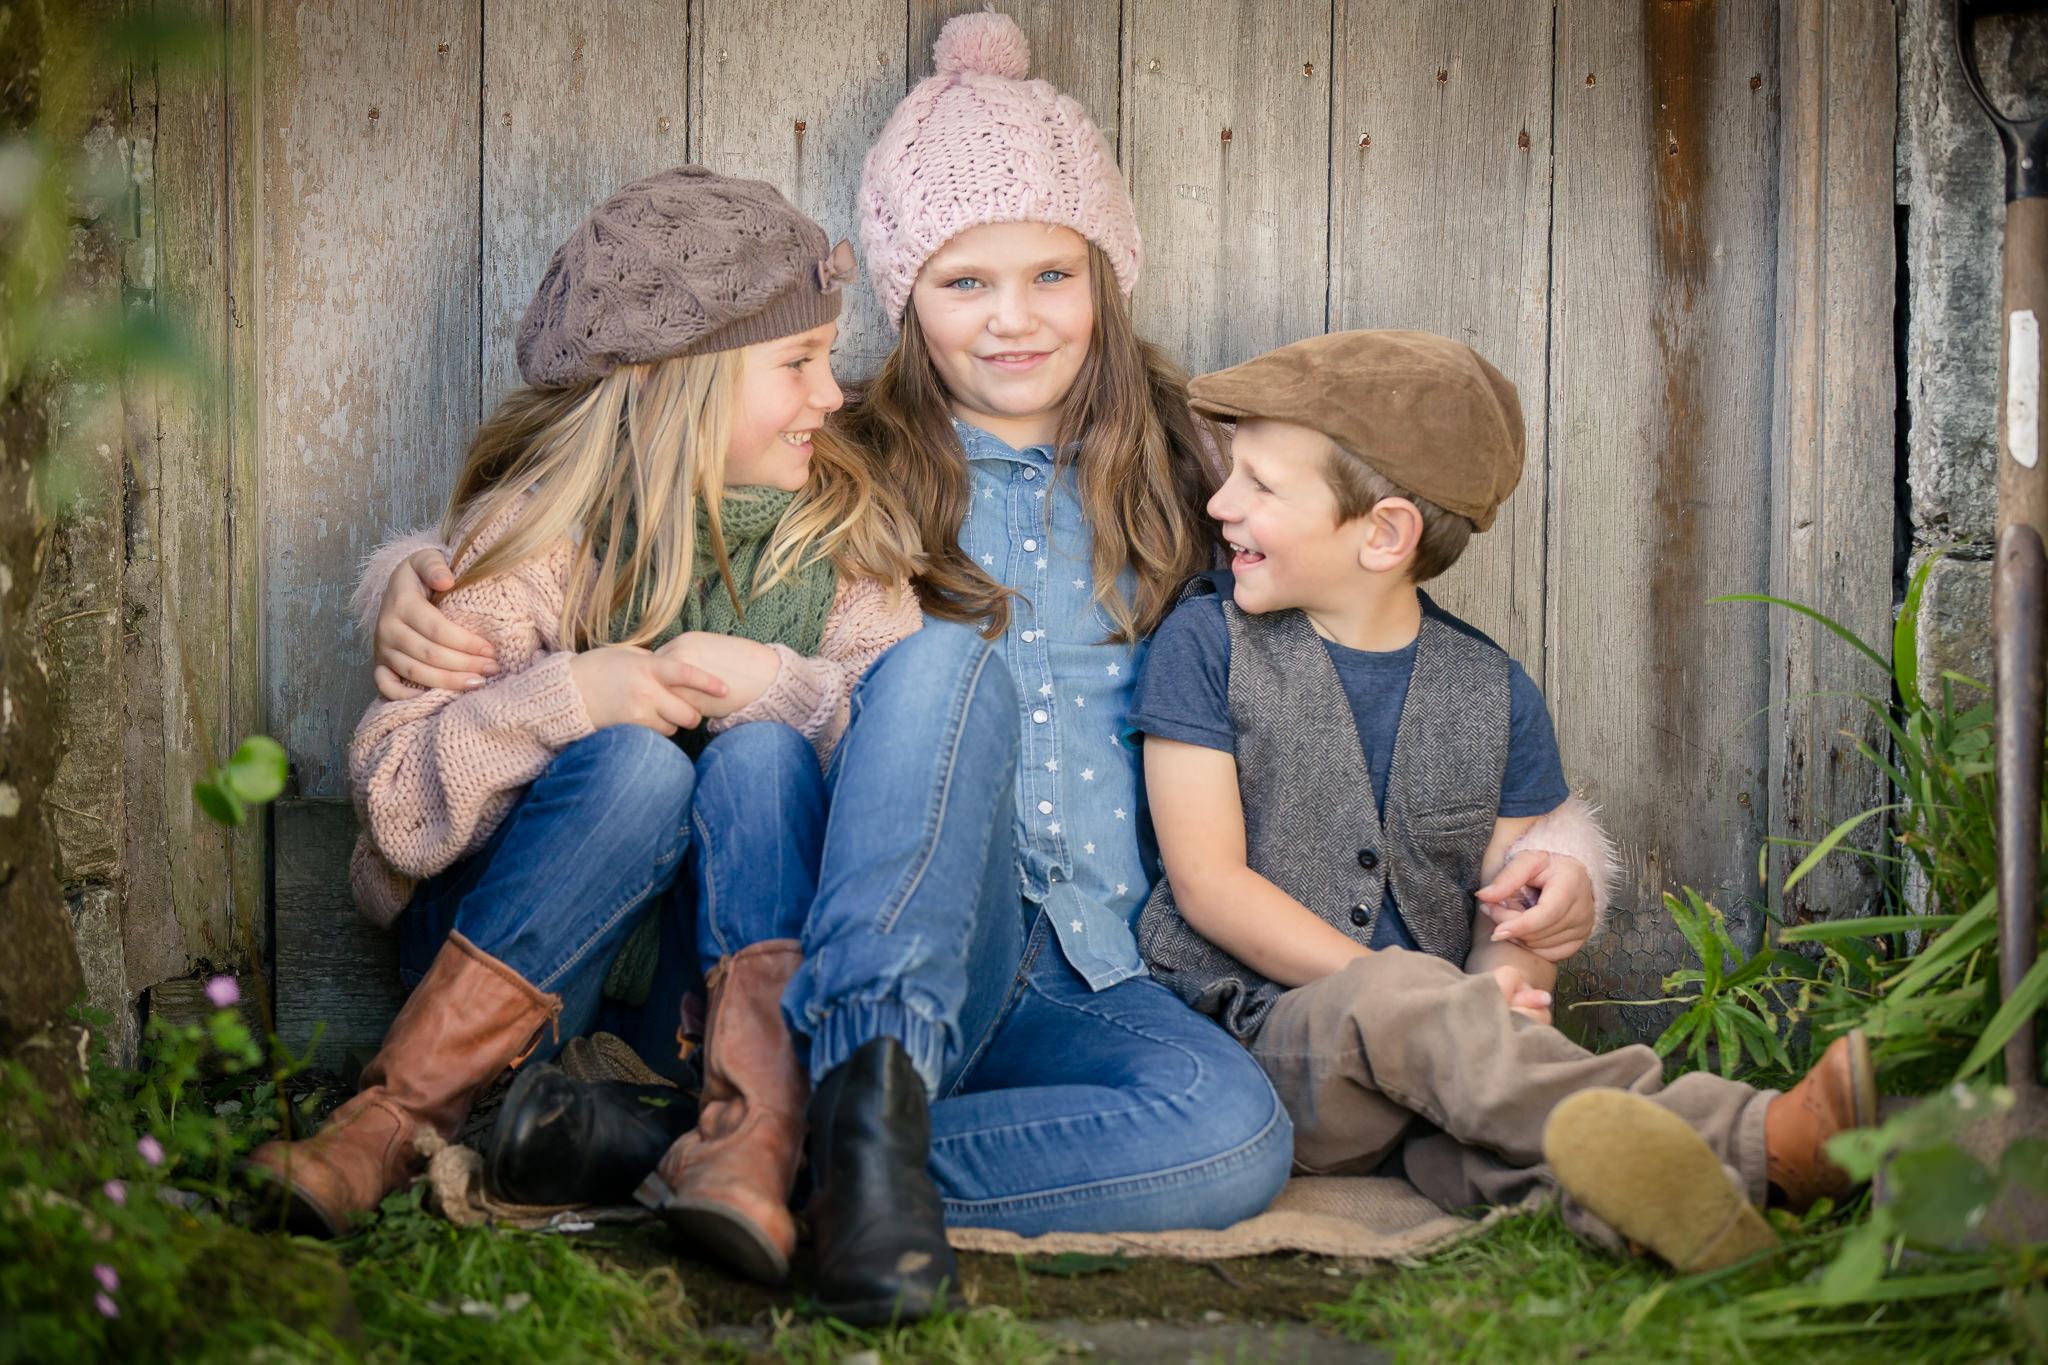 Specialist-Children-Photographer-In-Hampshire